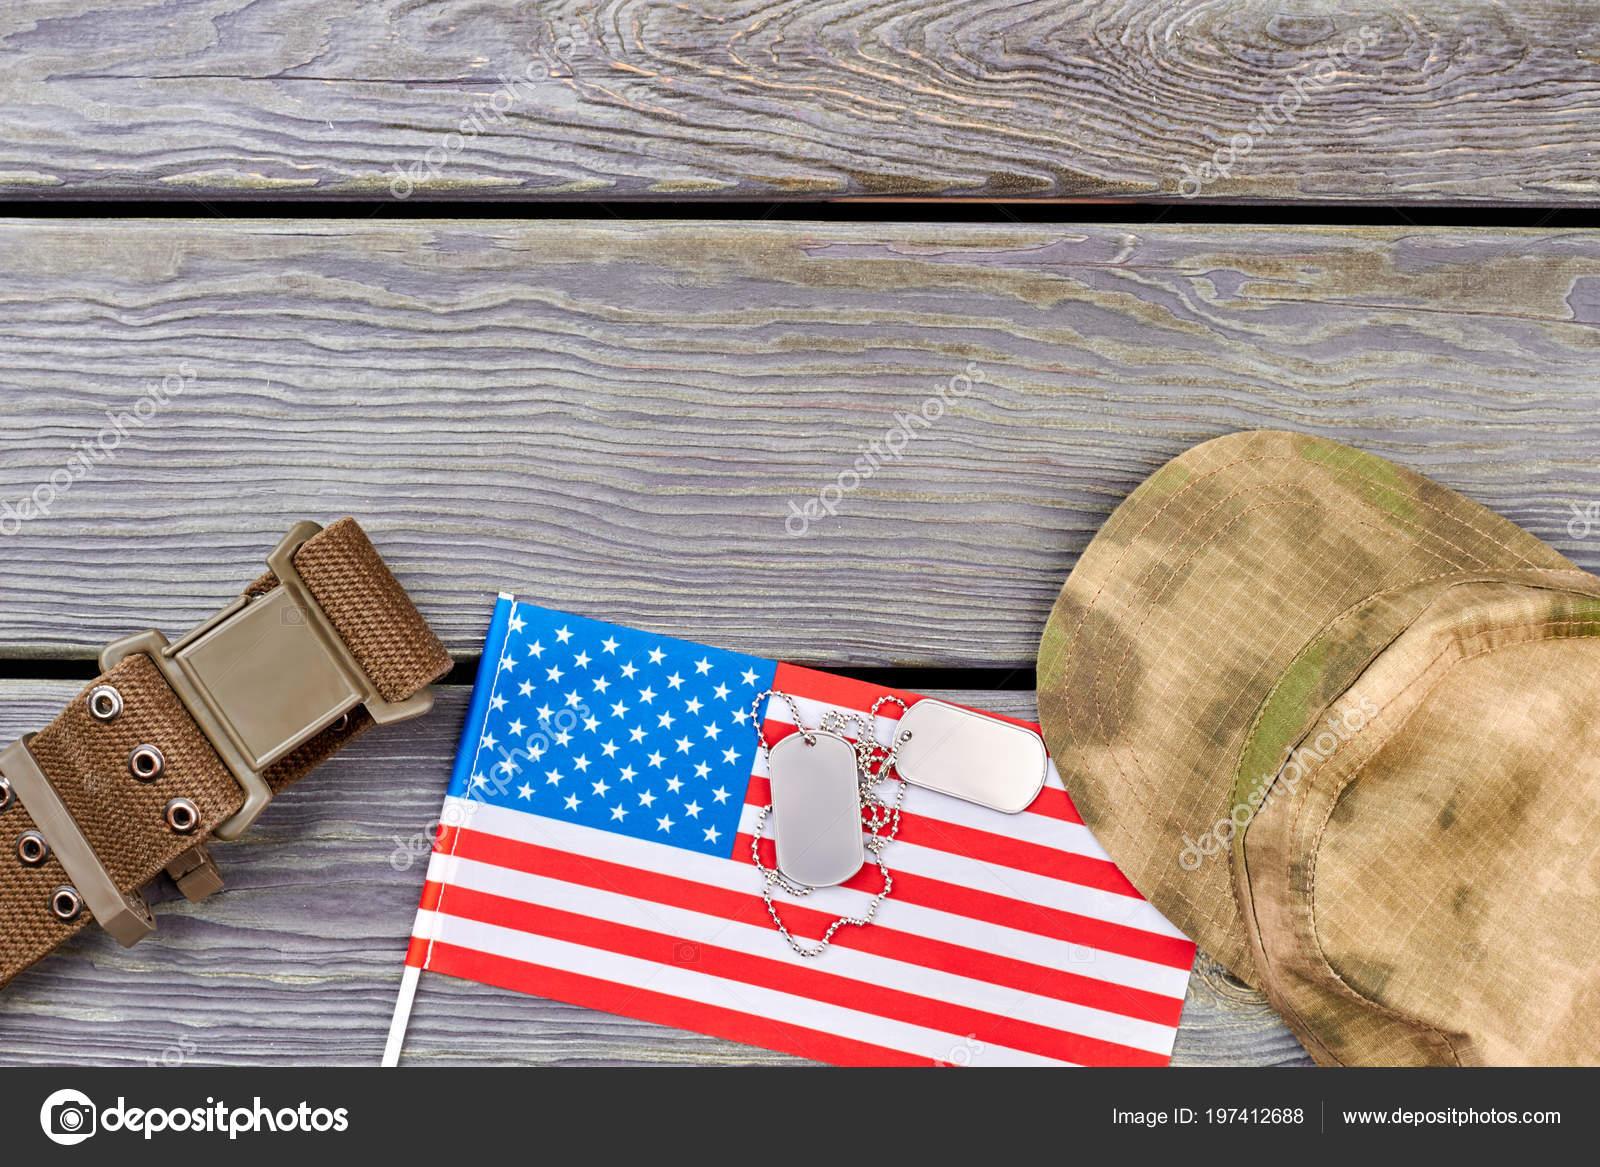 f911cf67664 American Flag Baseball Cap Military - Best Picture Of Flag Imagesco.Org